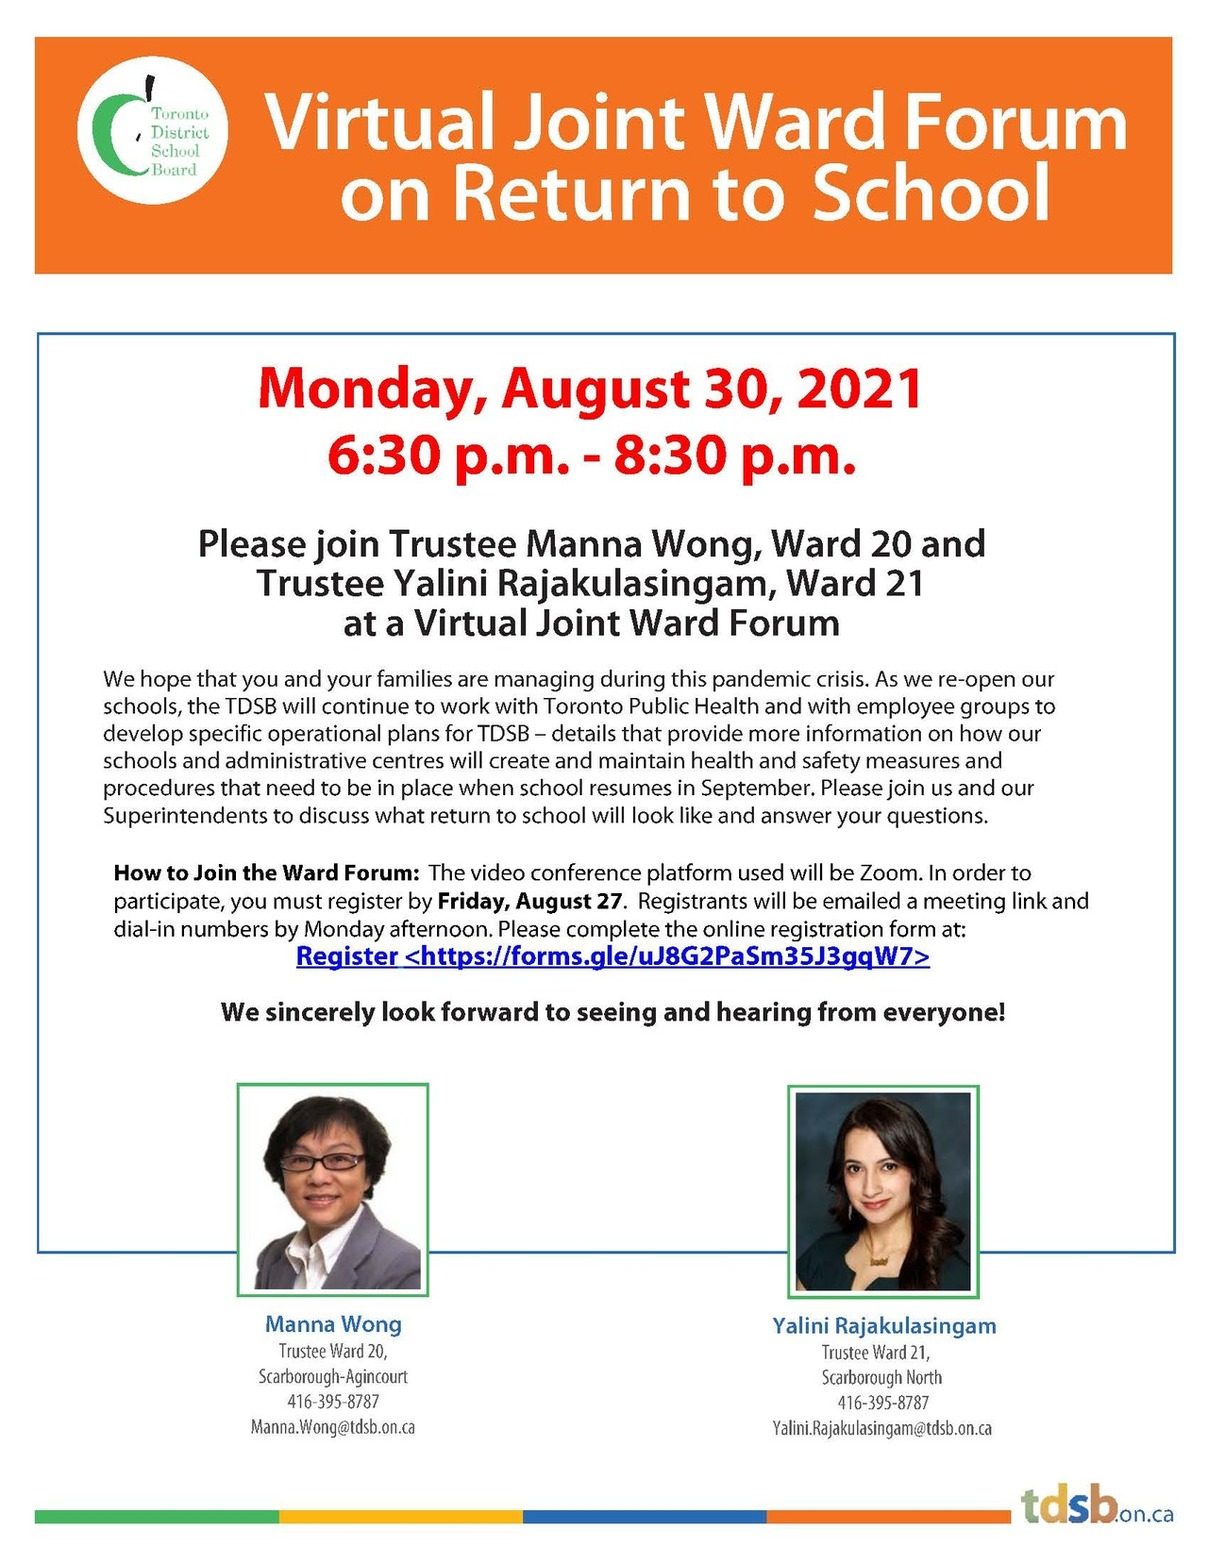 Flyer for Ward 20 and Ward 21 Virtual Ward Forum